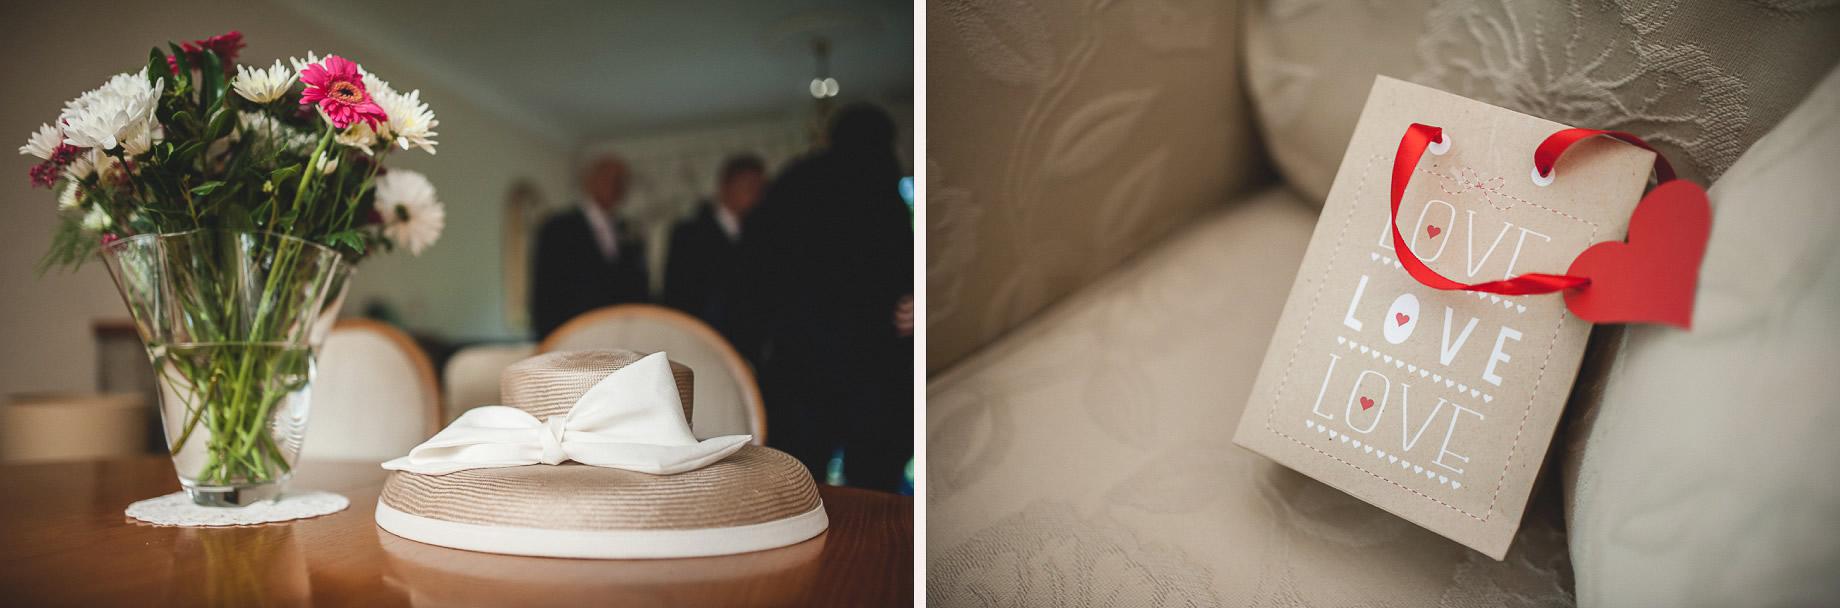 Helen and Matt's Wedding at Mitton Hall 005